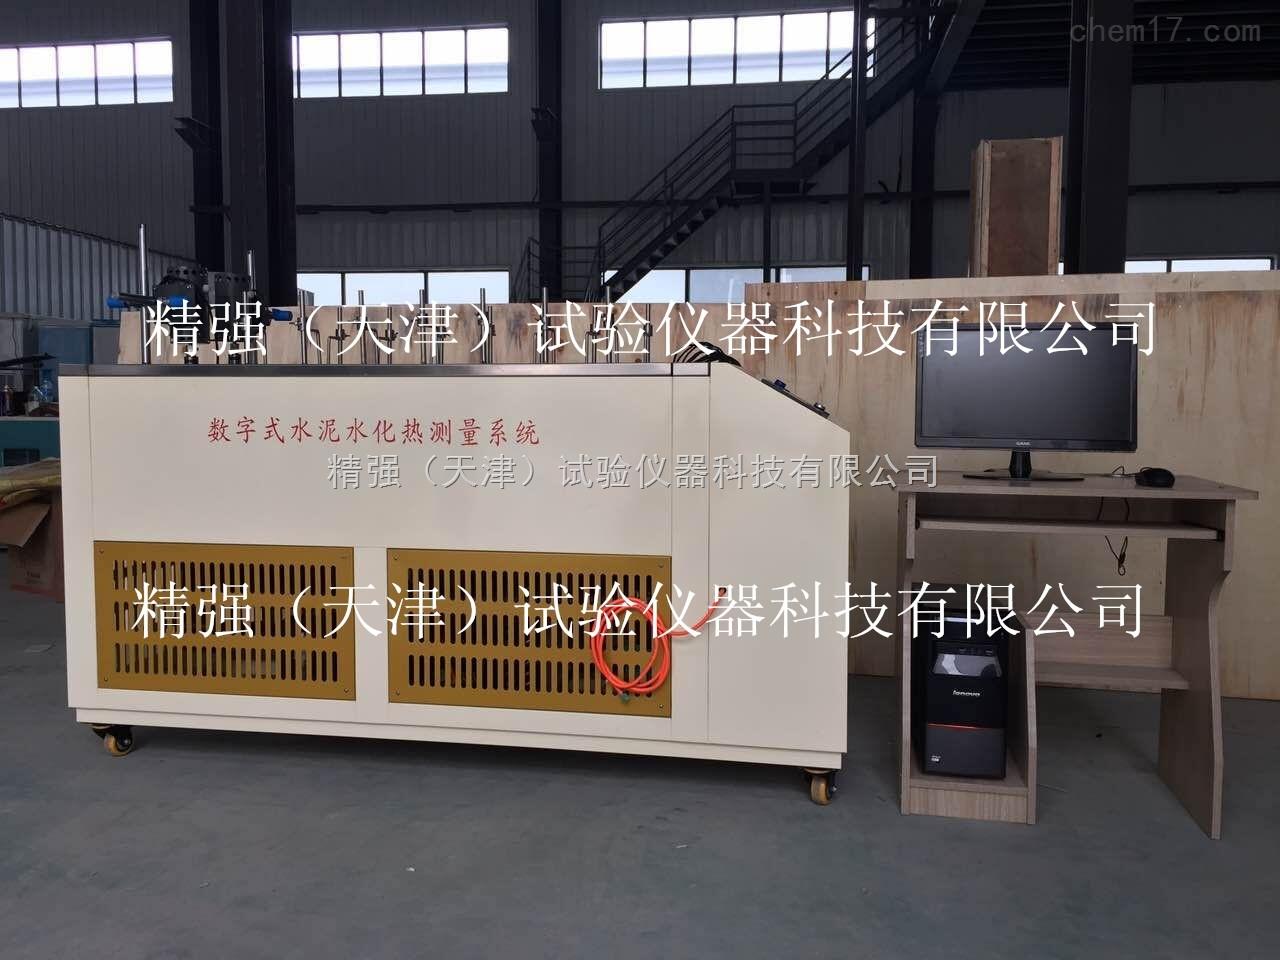 SHR-16-武汉水泥水化热测量系统